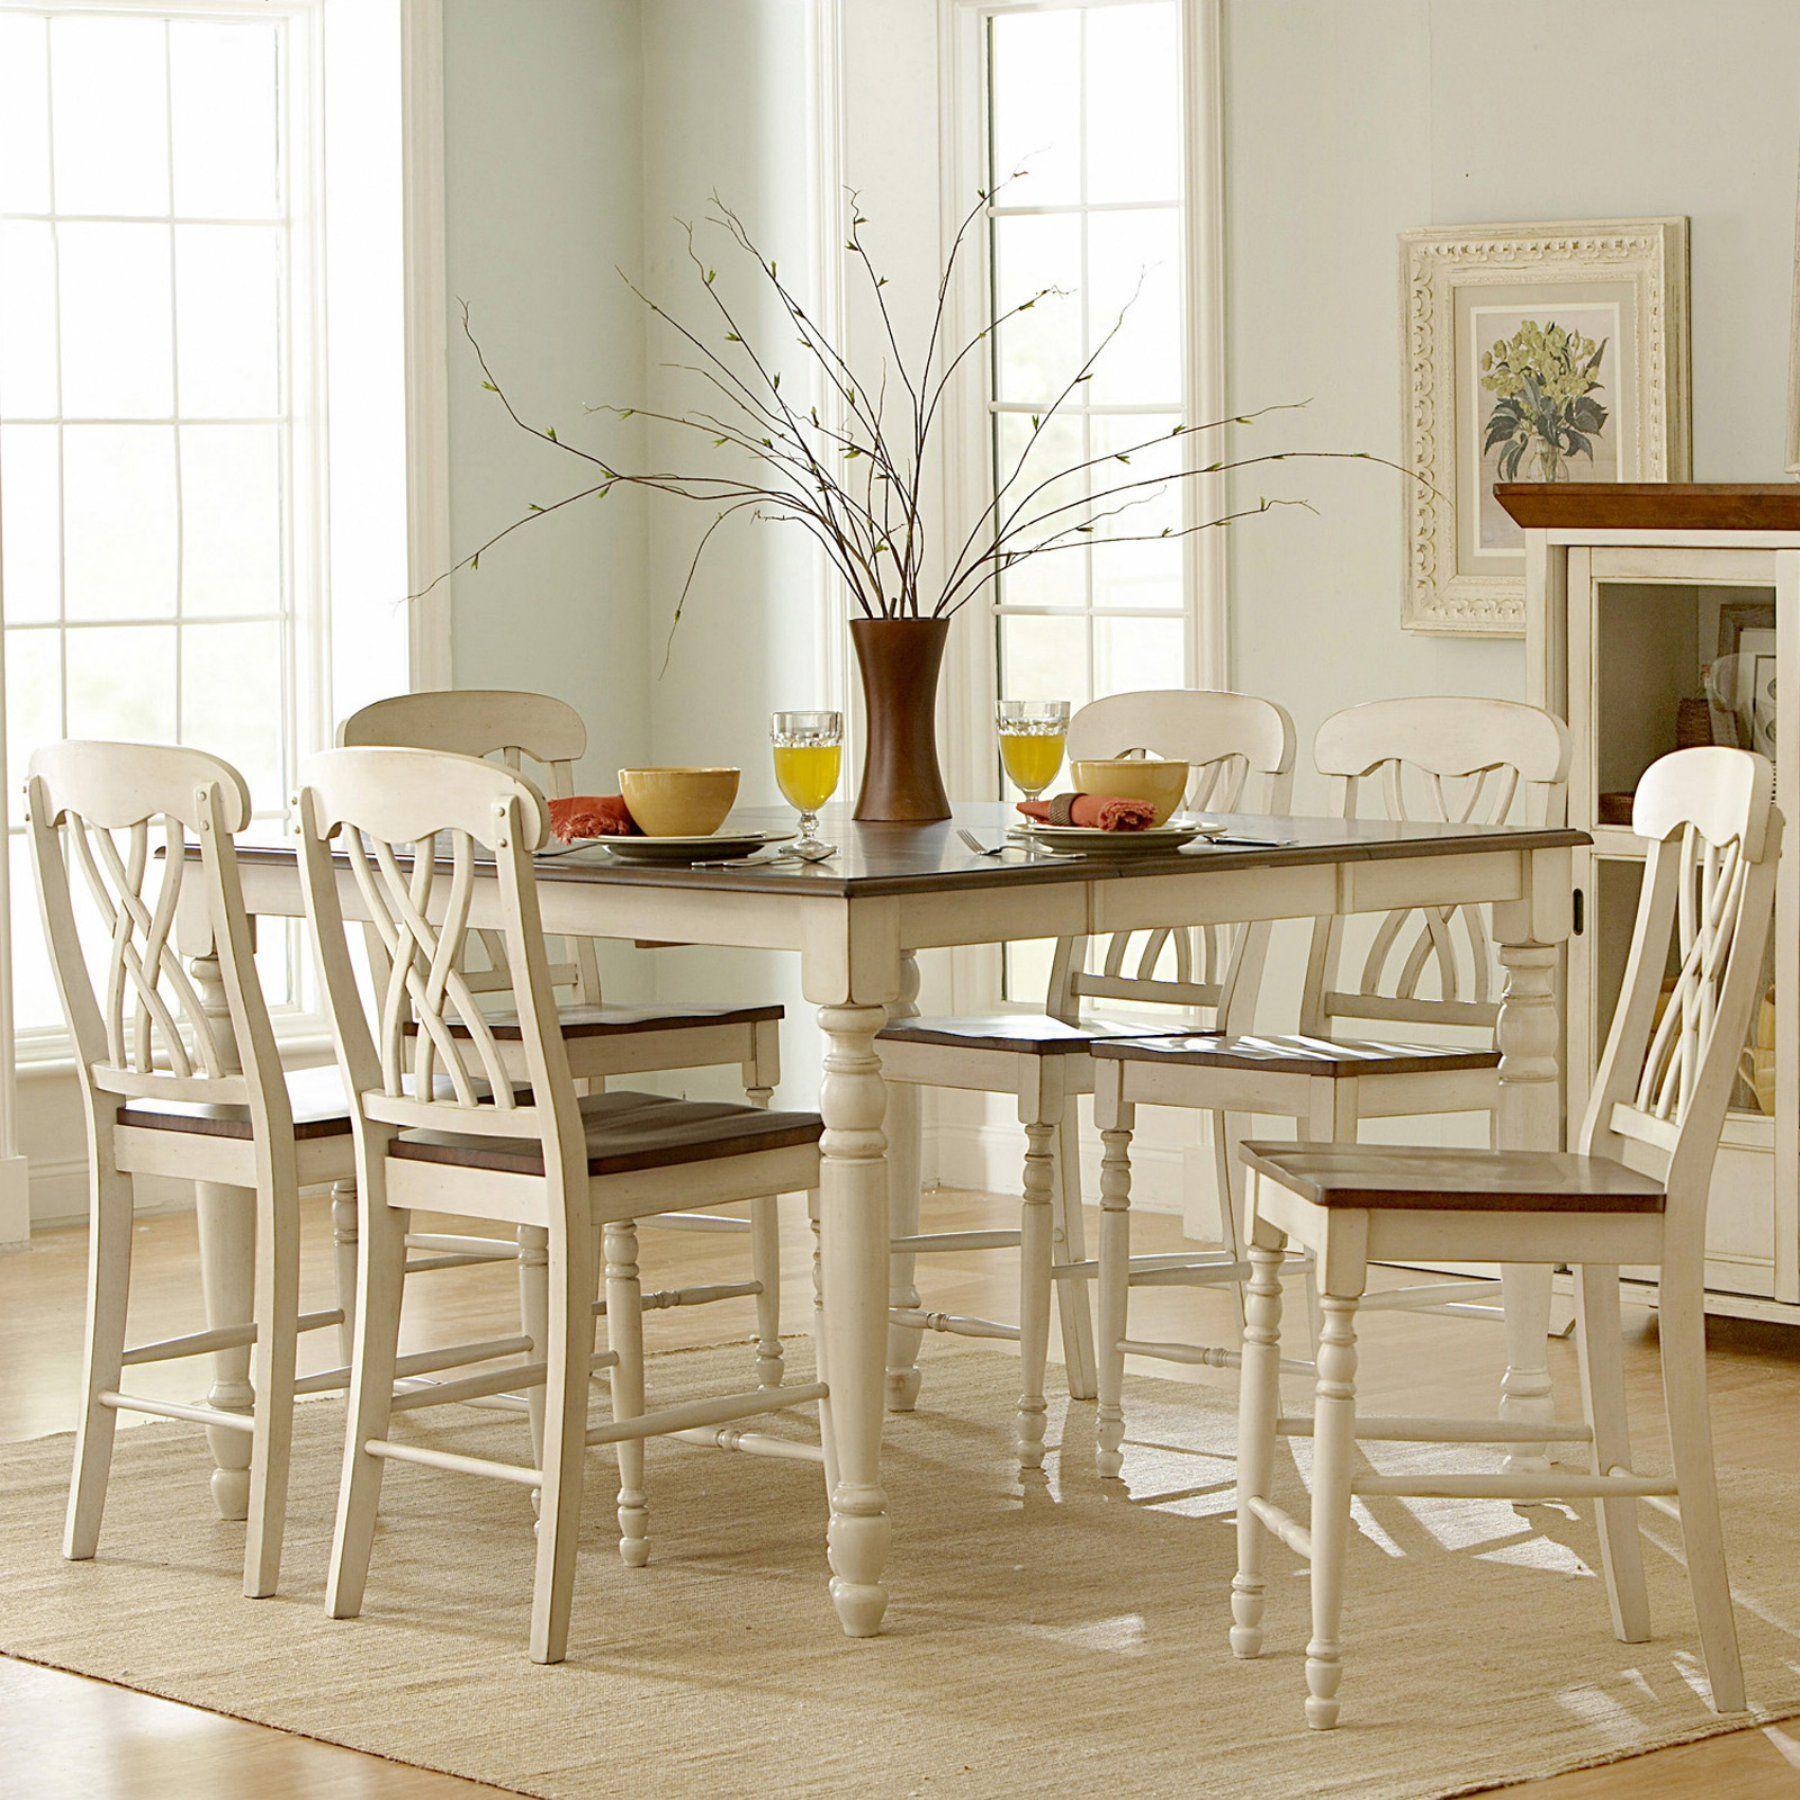 Weston Home Ohana 7 Piece Square Counter Height Set - Antique White & Cherry - HME2111 | White ...